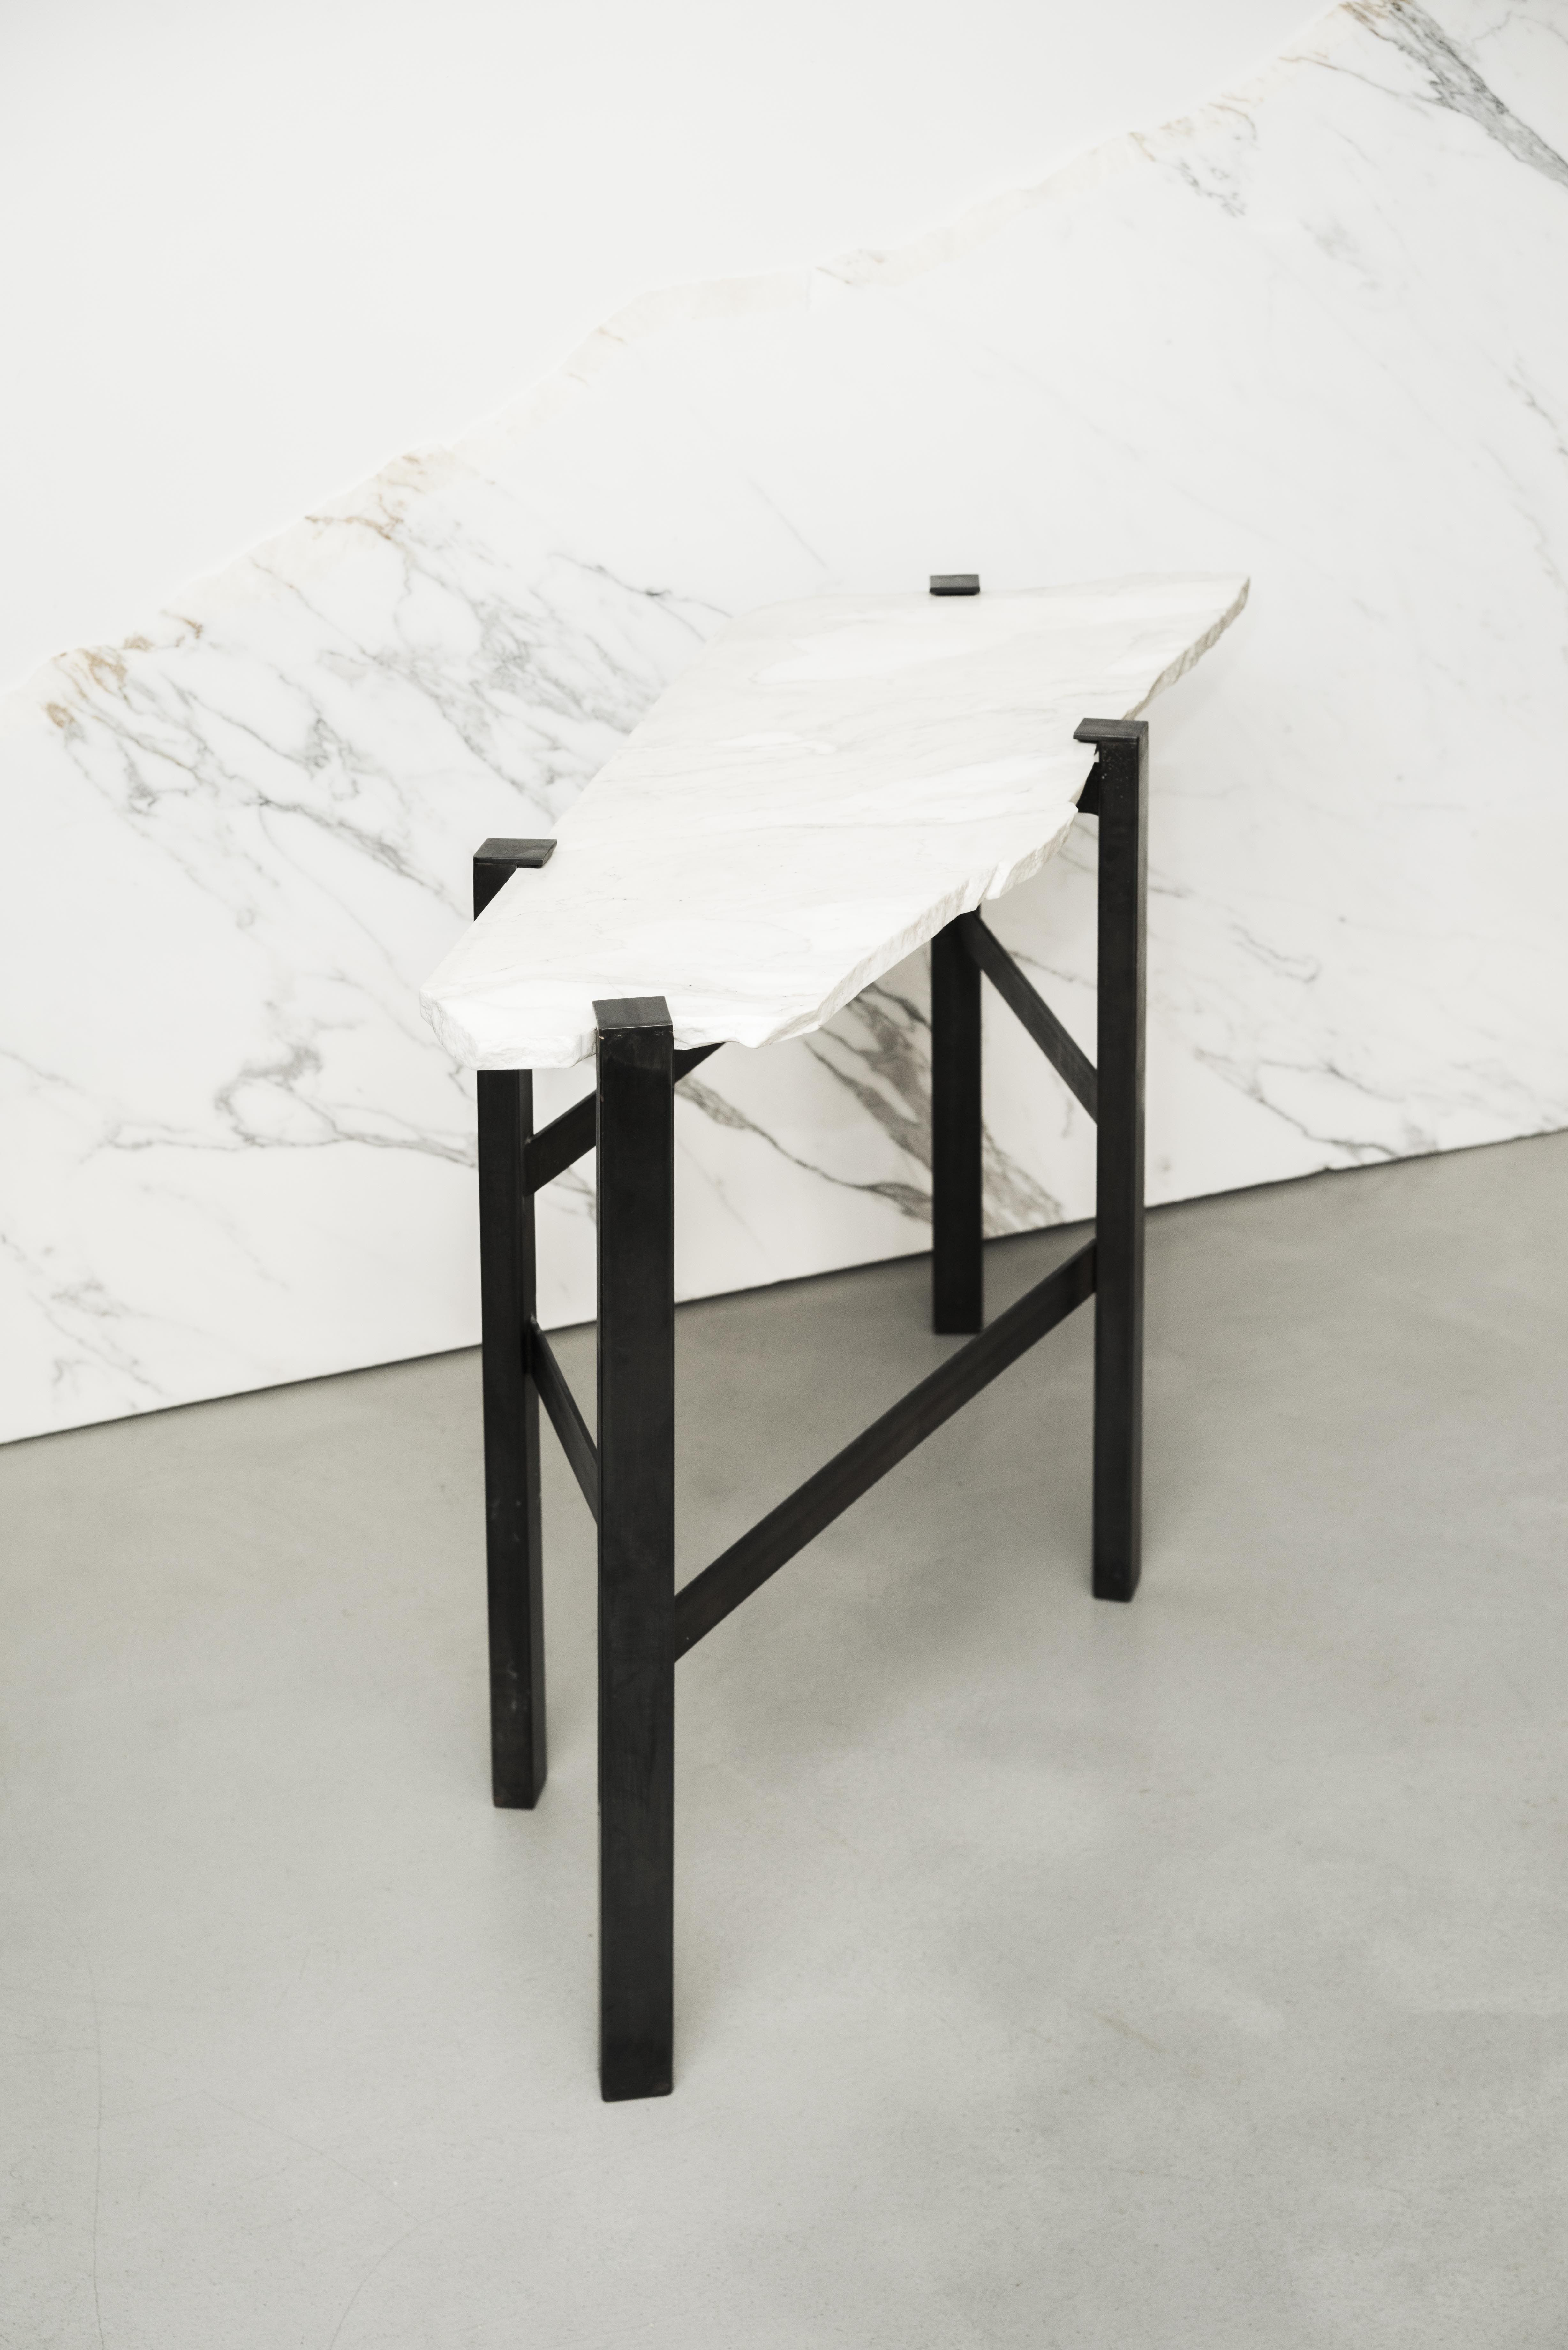 TABLE SOPHIE DRIES ARCHITECT Metal Pinterest